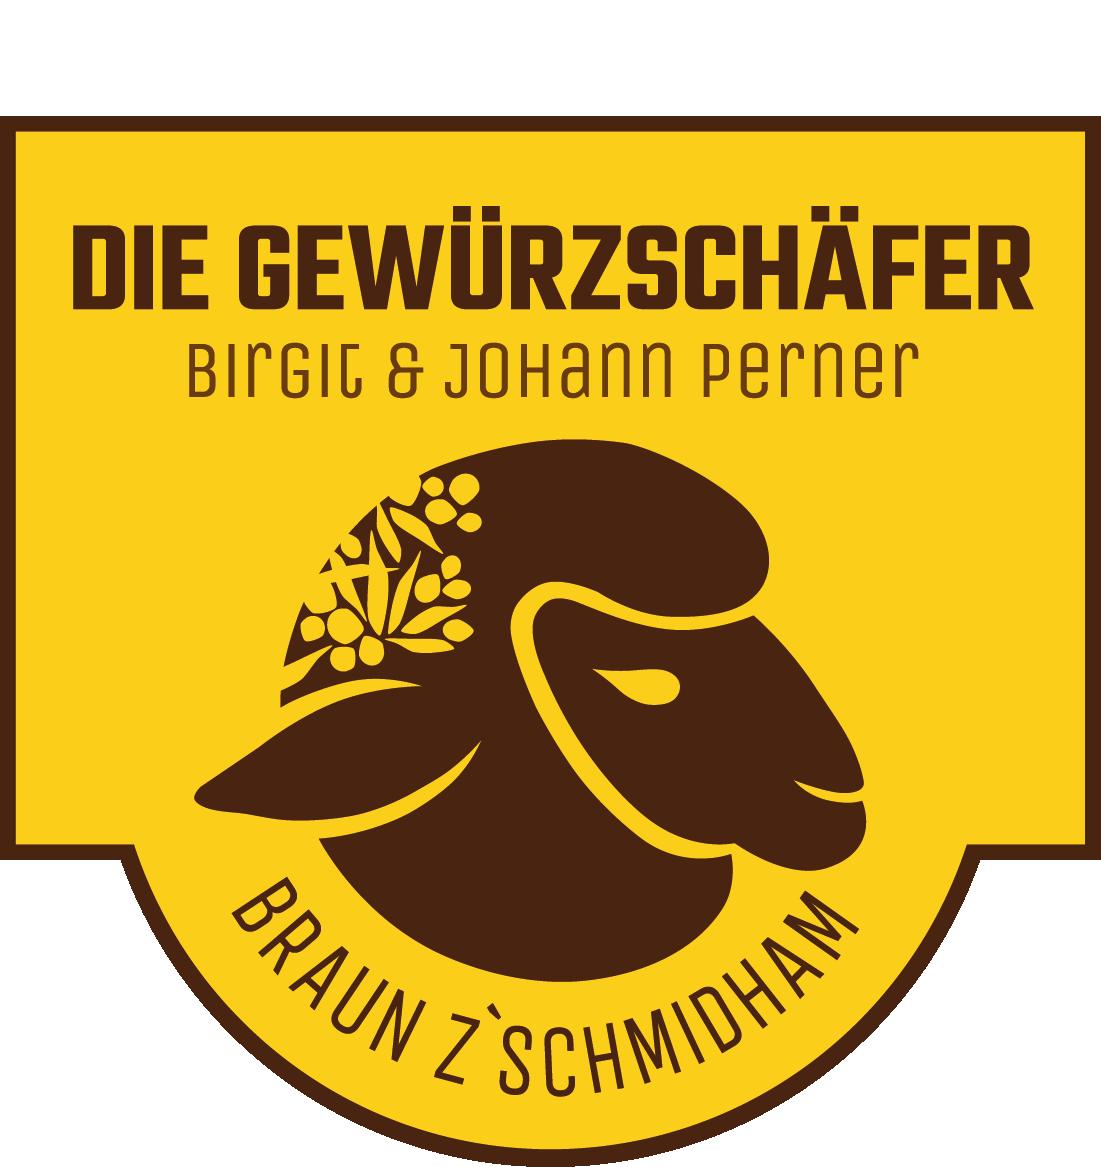 Braun´z Schmidham Perner | Perner Pilsbach, Schafzucht Produktion Oberösterreich, Öle, Gewürze, Lammfelle, Lammfleisch – Ab Hof Verkauf; Leinsamen, Kümmel, Koriander, Blaumohn, Rapsöl, Leinöl